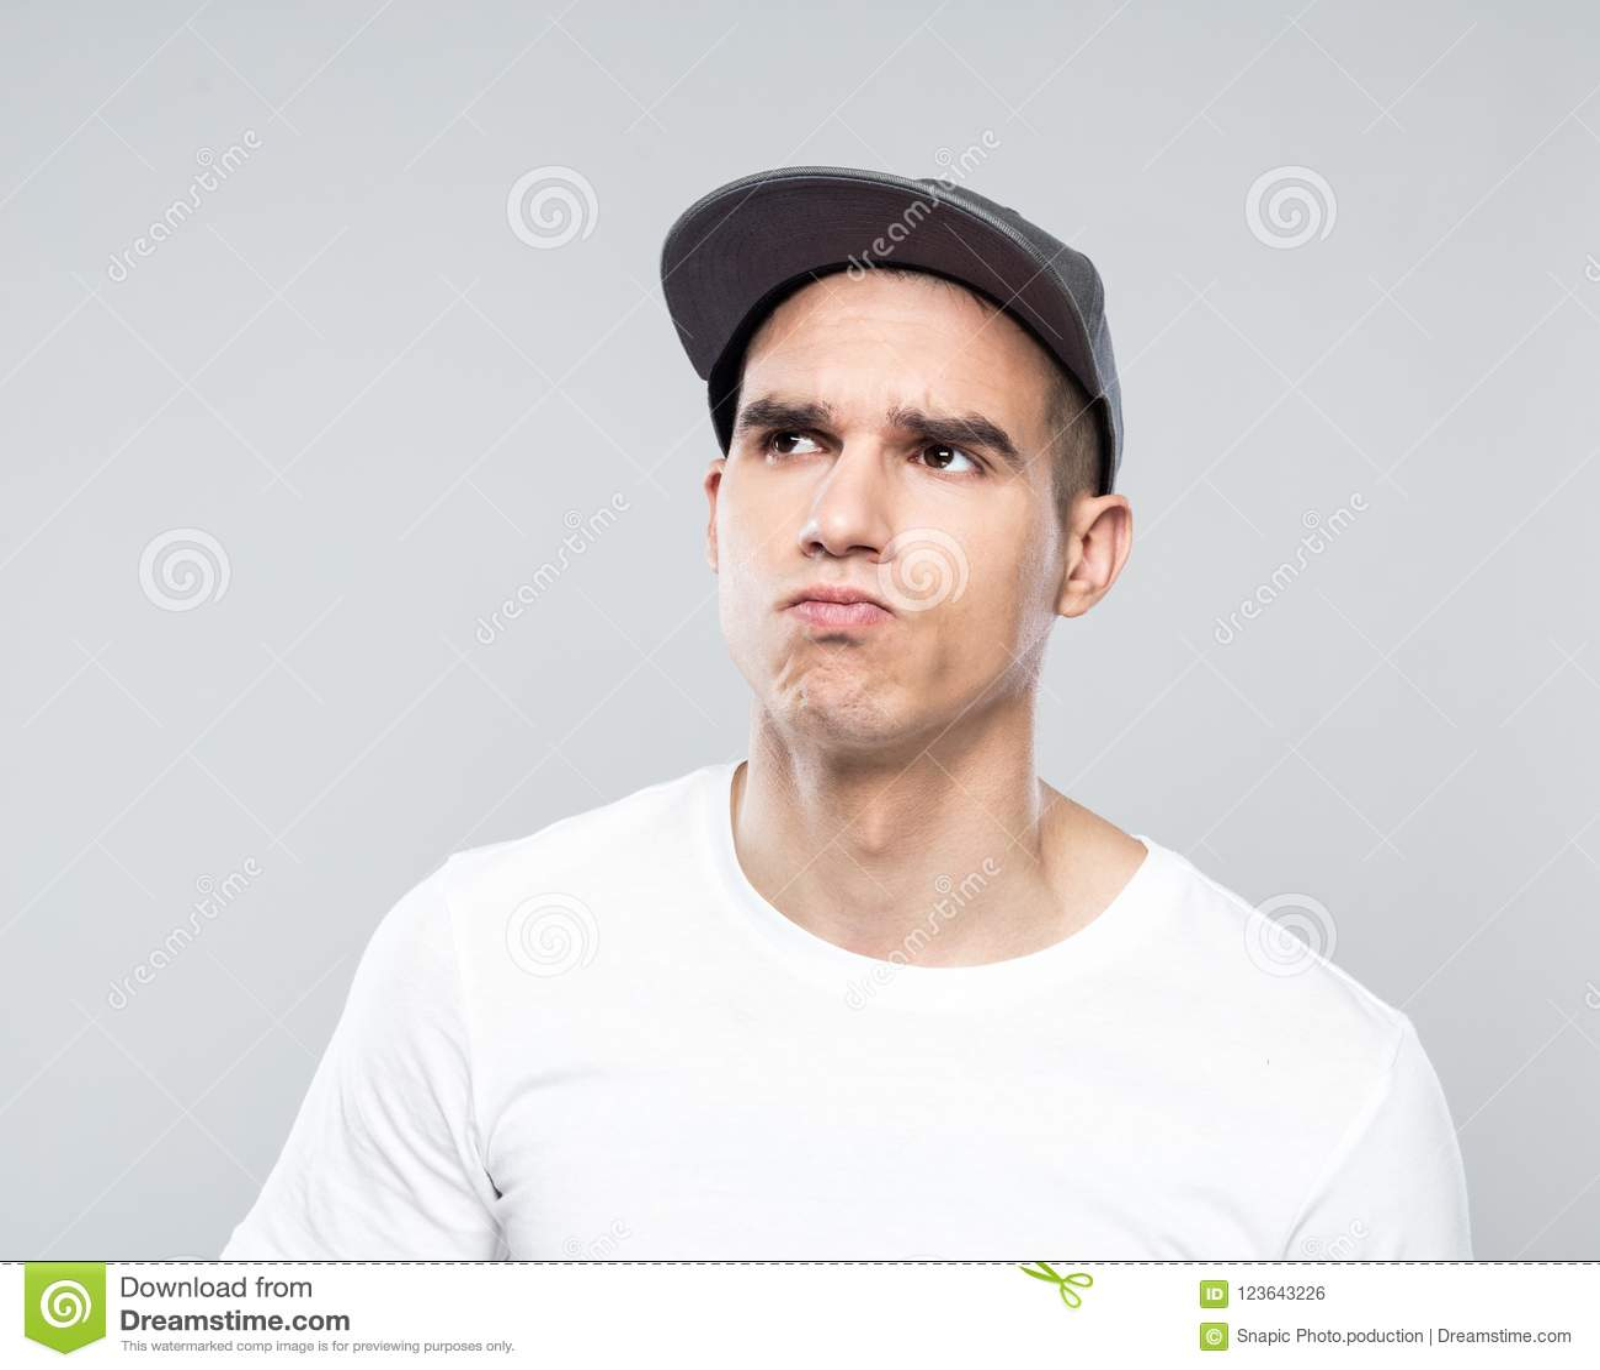 Portrait of uncertain young man in baseball cap